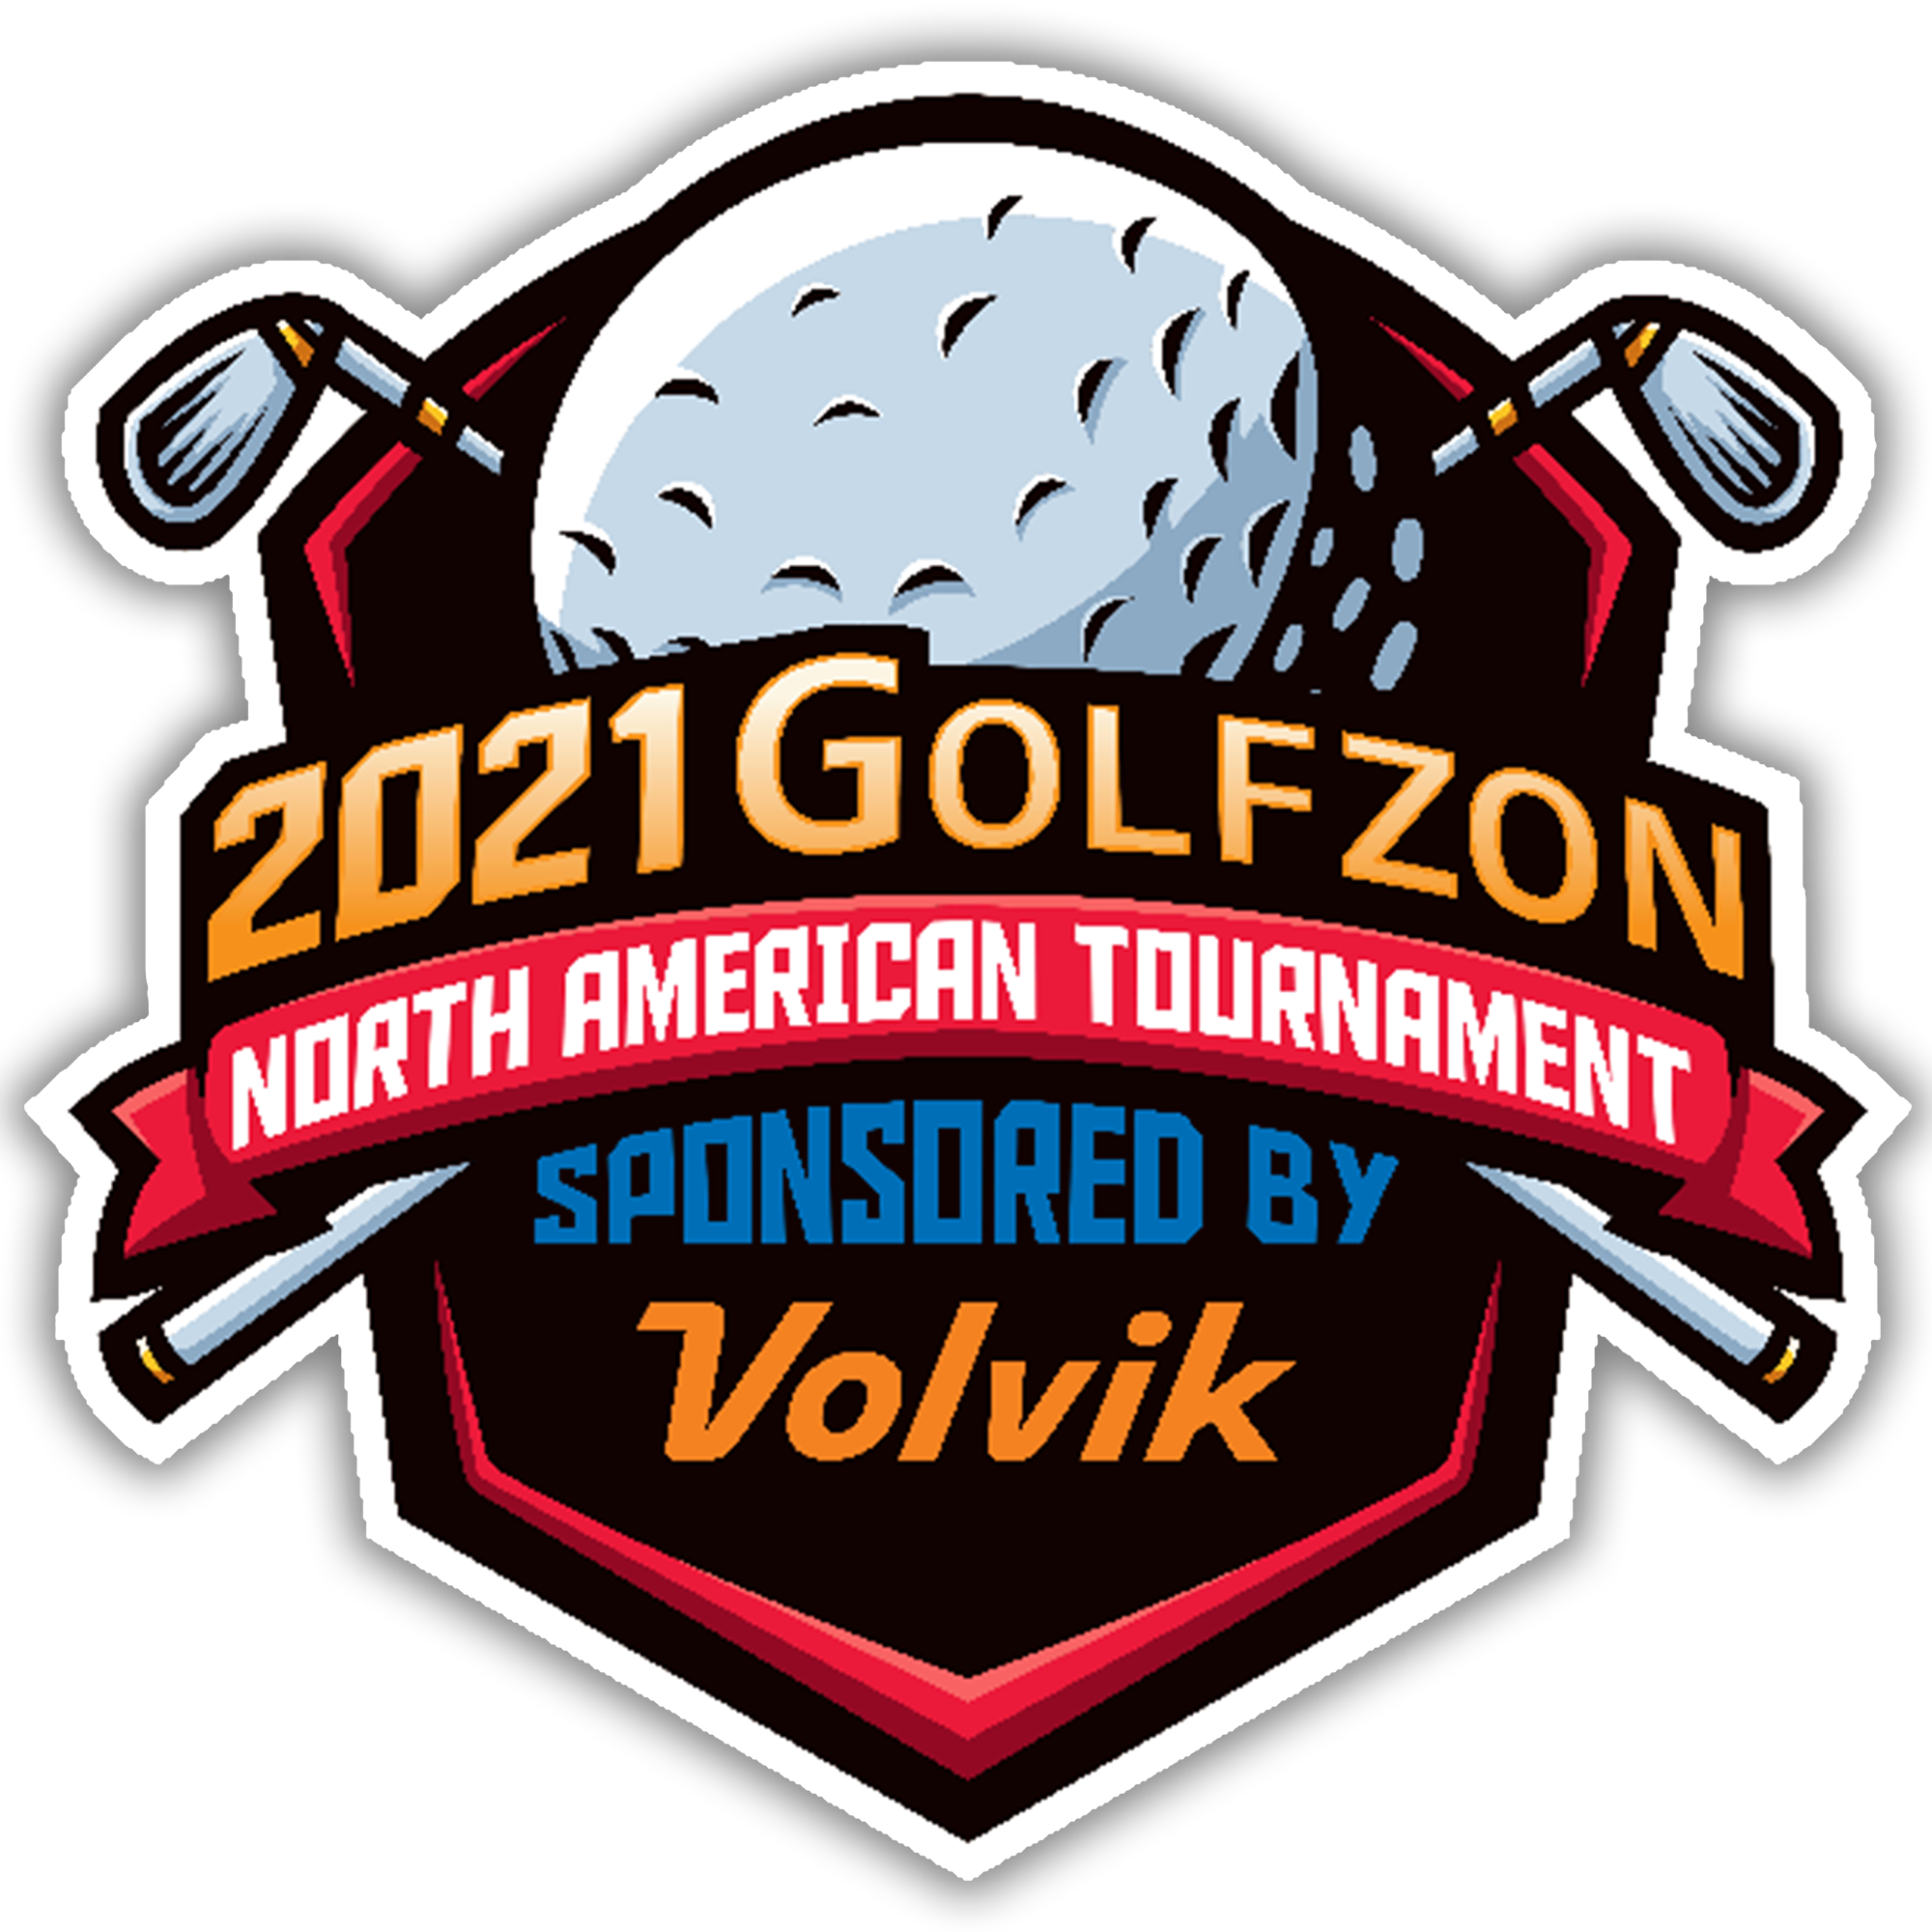 Golfzon North American Tournament Logo